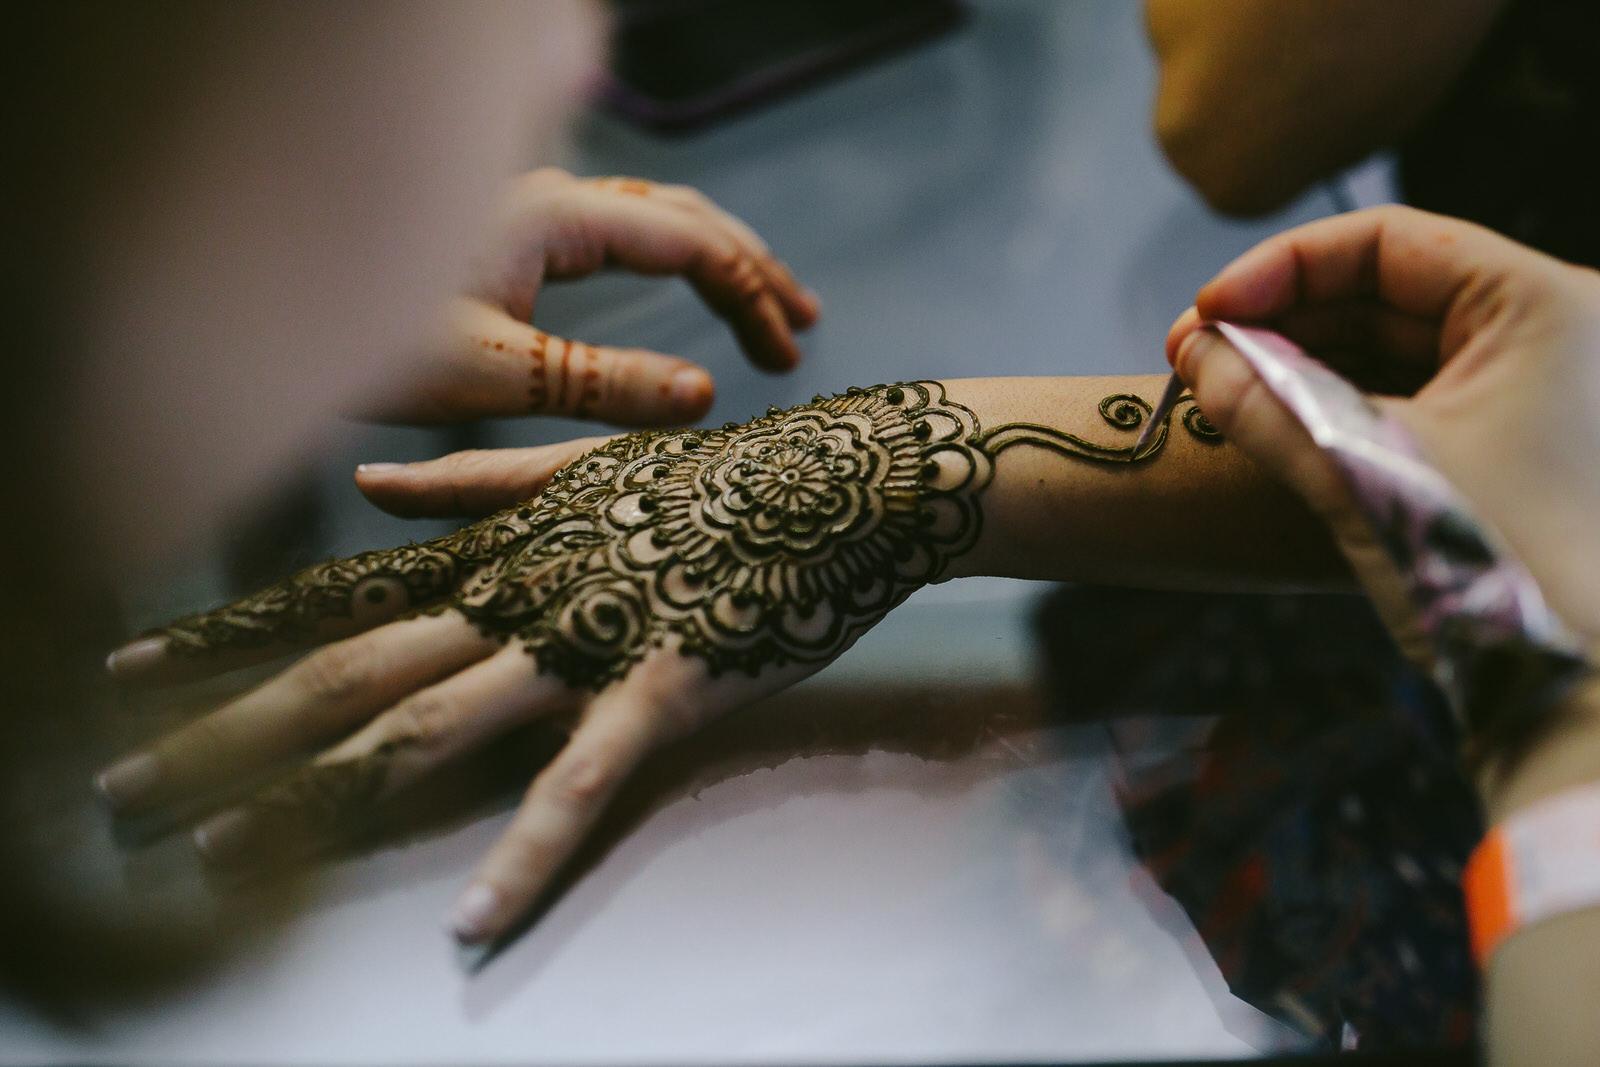 central-florida-wedding-photographer-tiny-house-photo-henna-ceremony.jpg